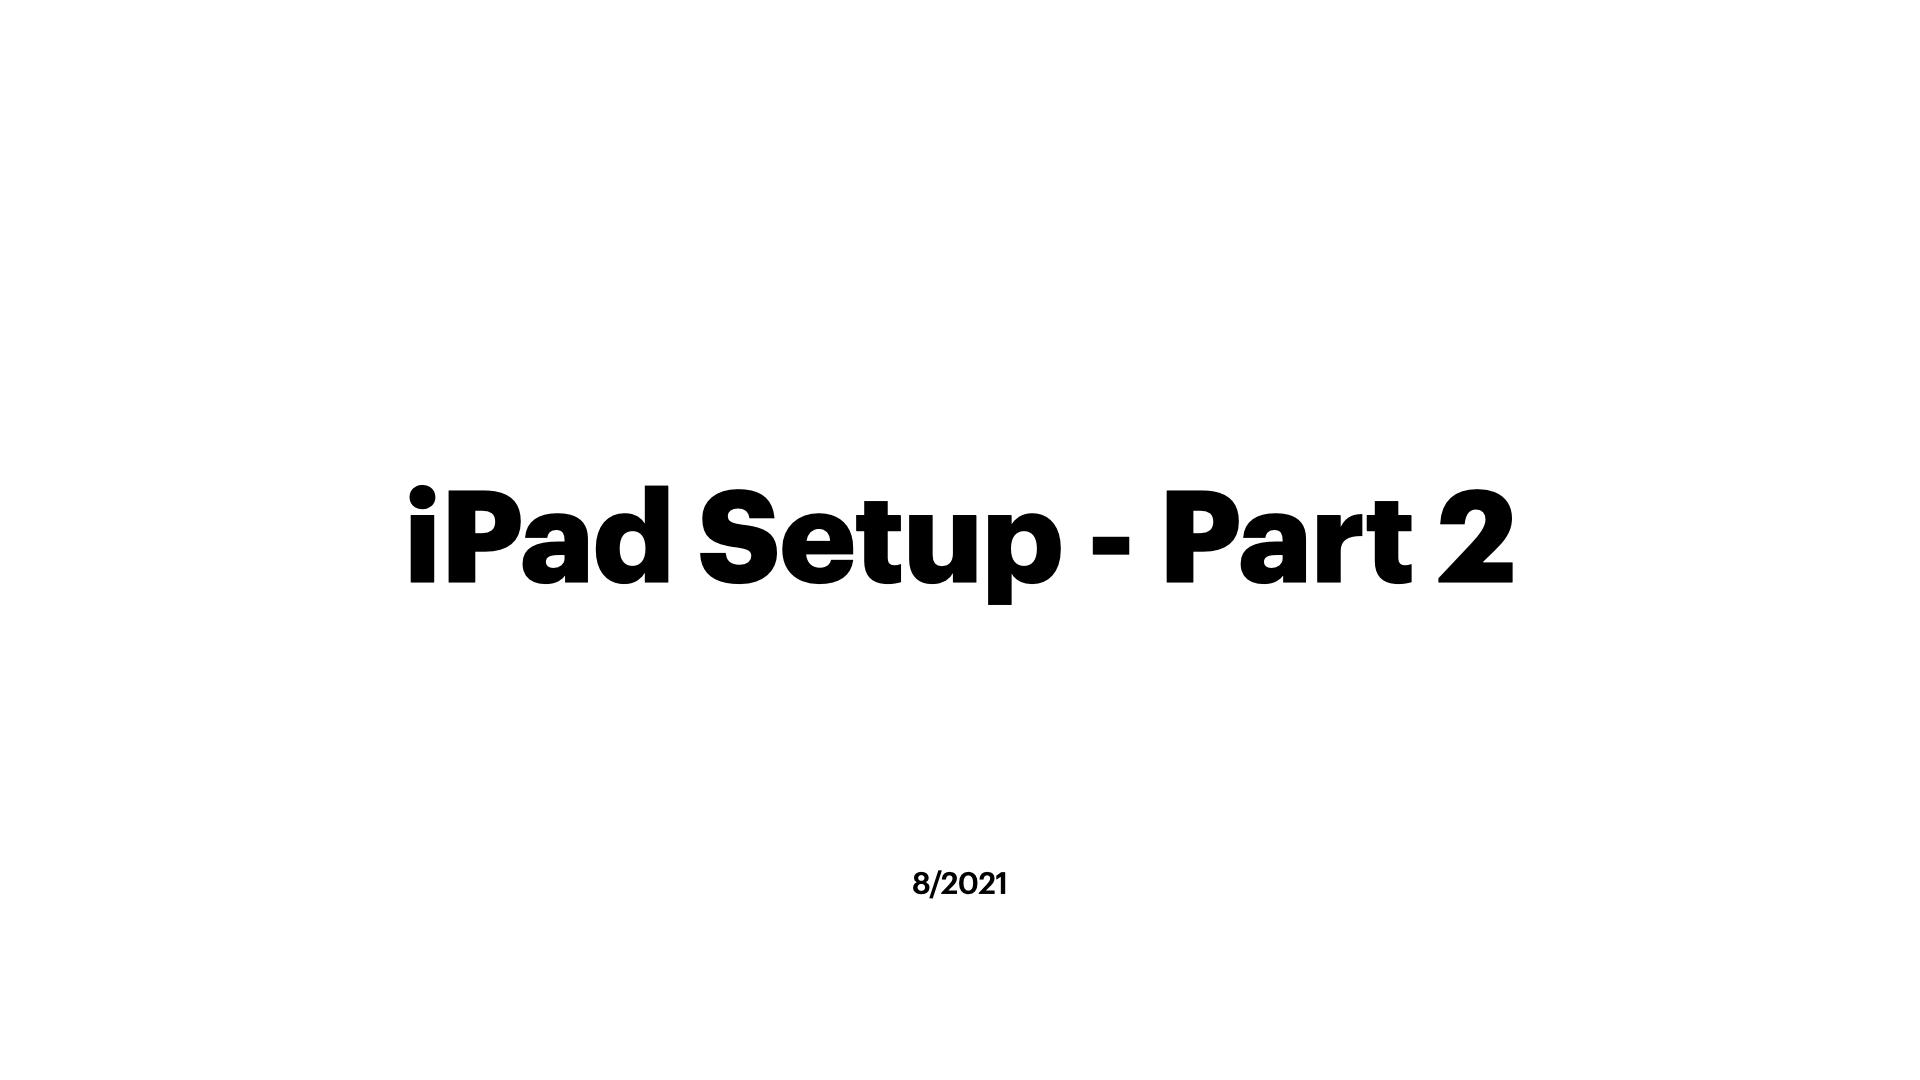 iPad Setup - Part 2